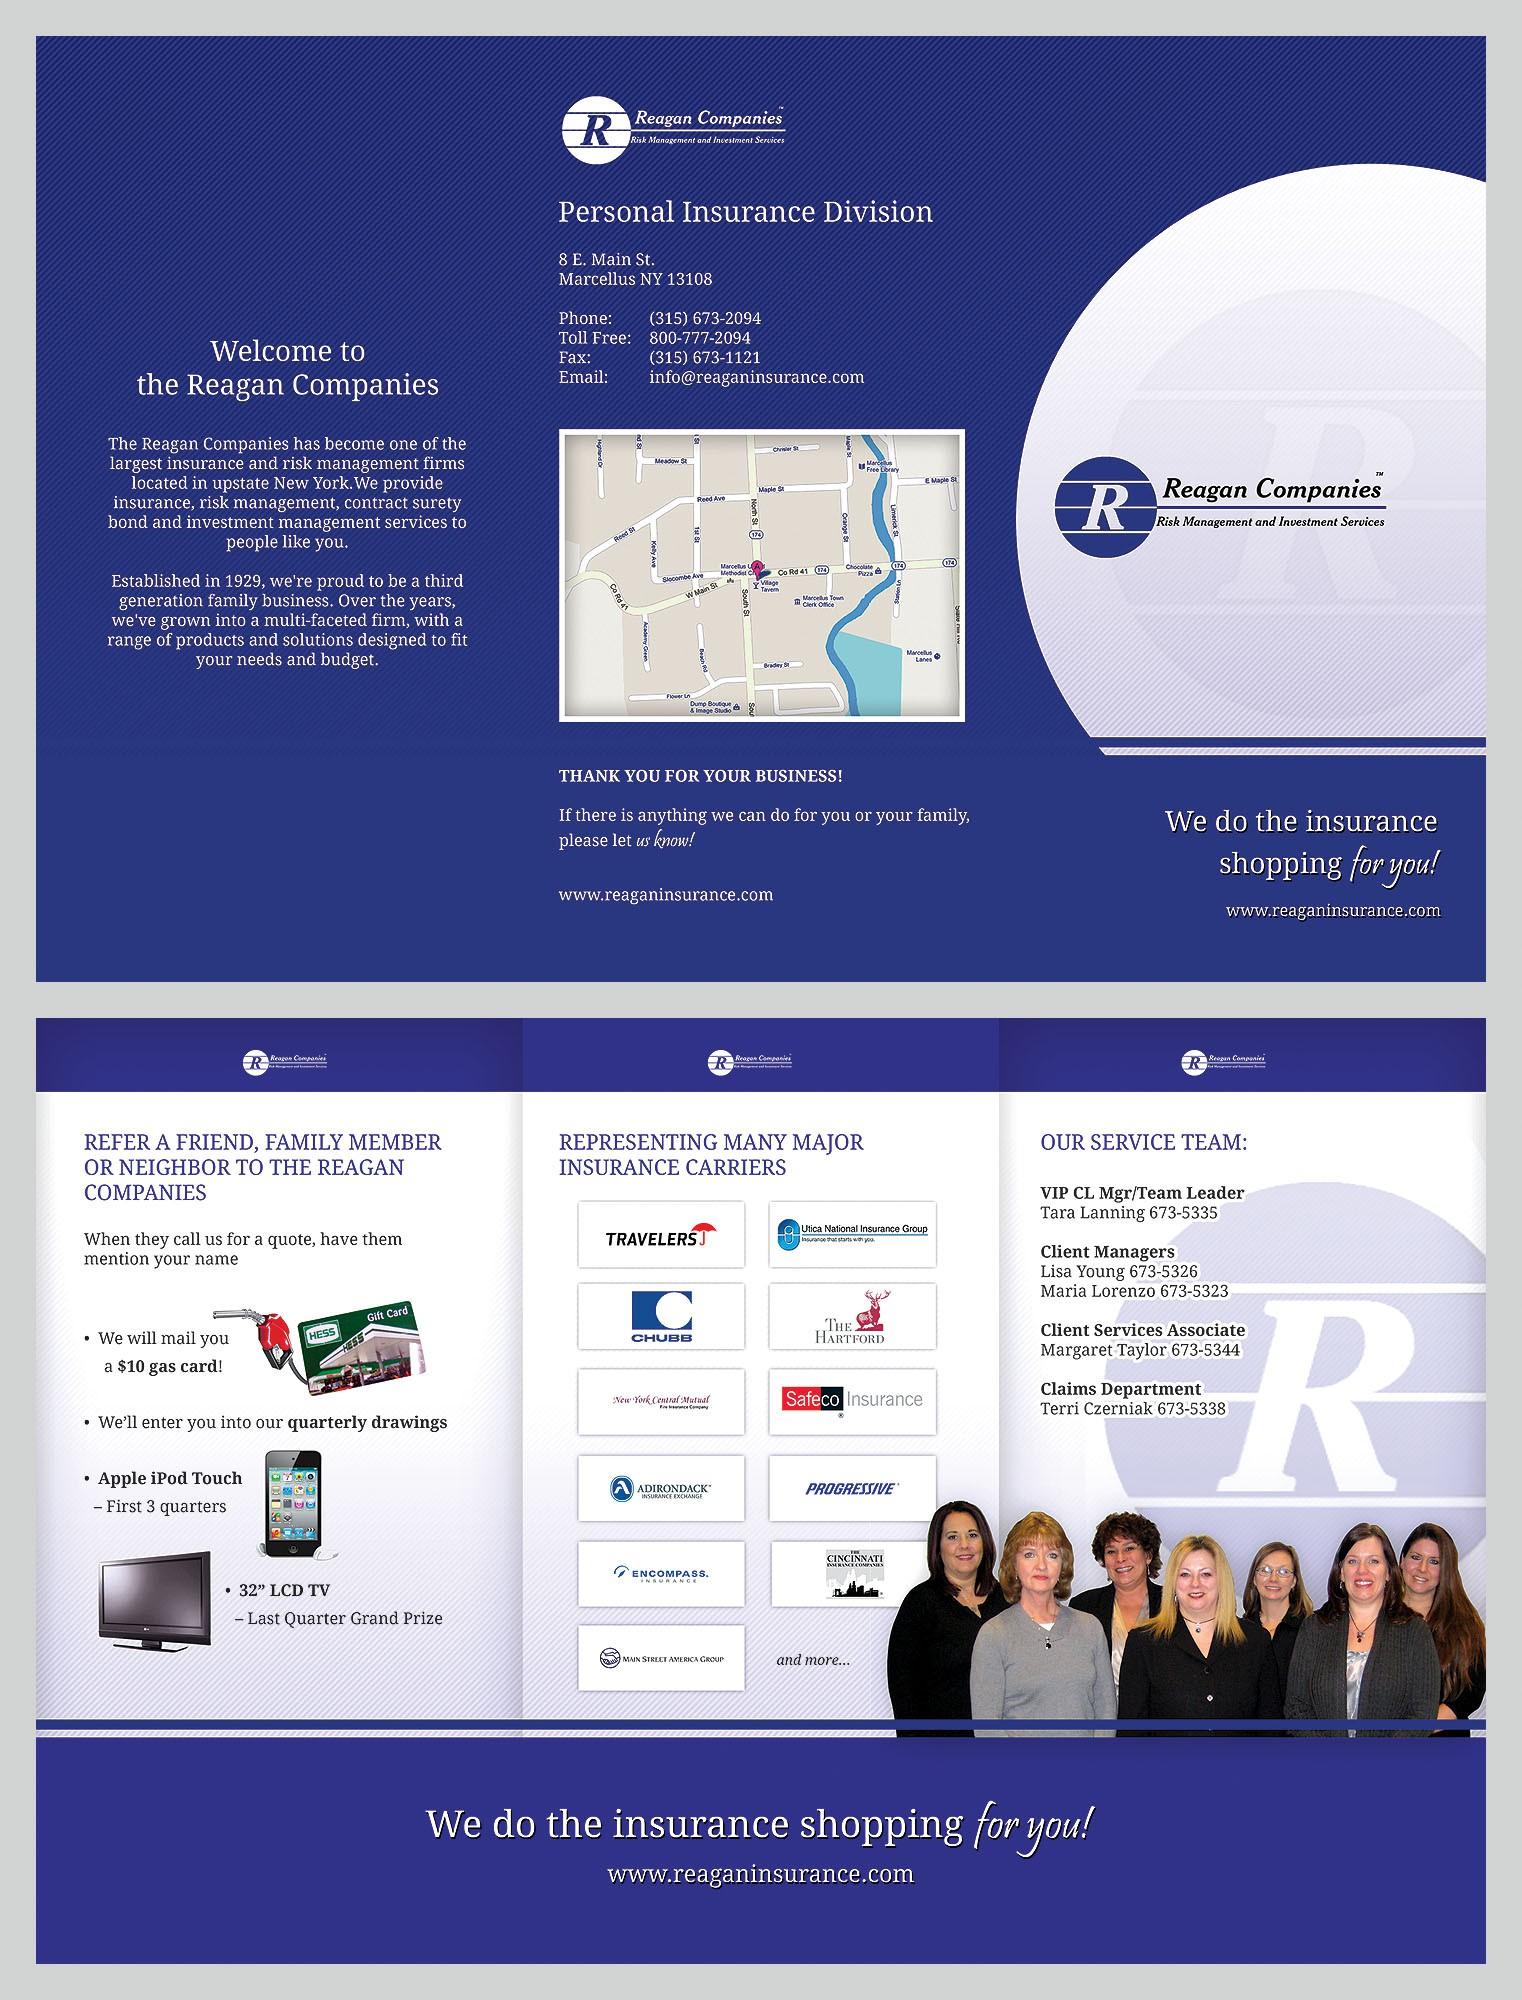 Reagan Companies - new tri-fold brochure design